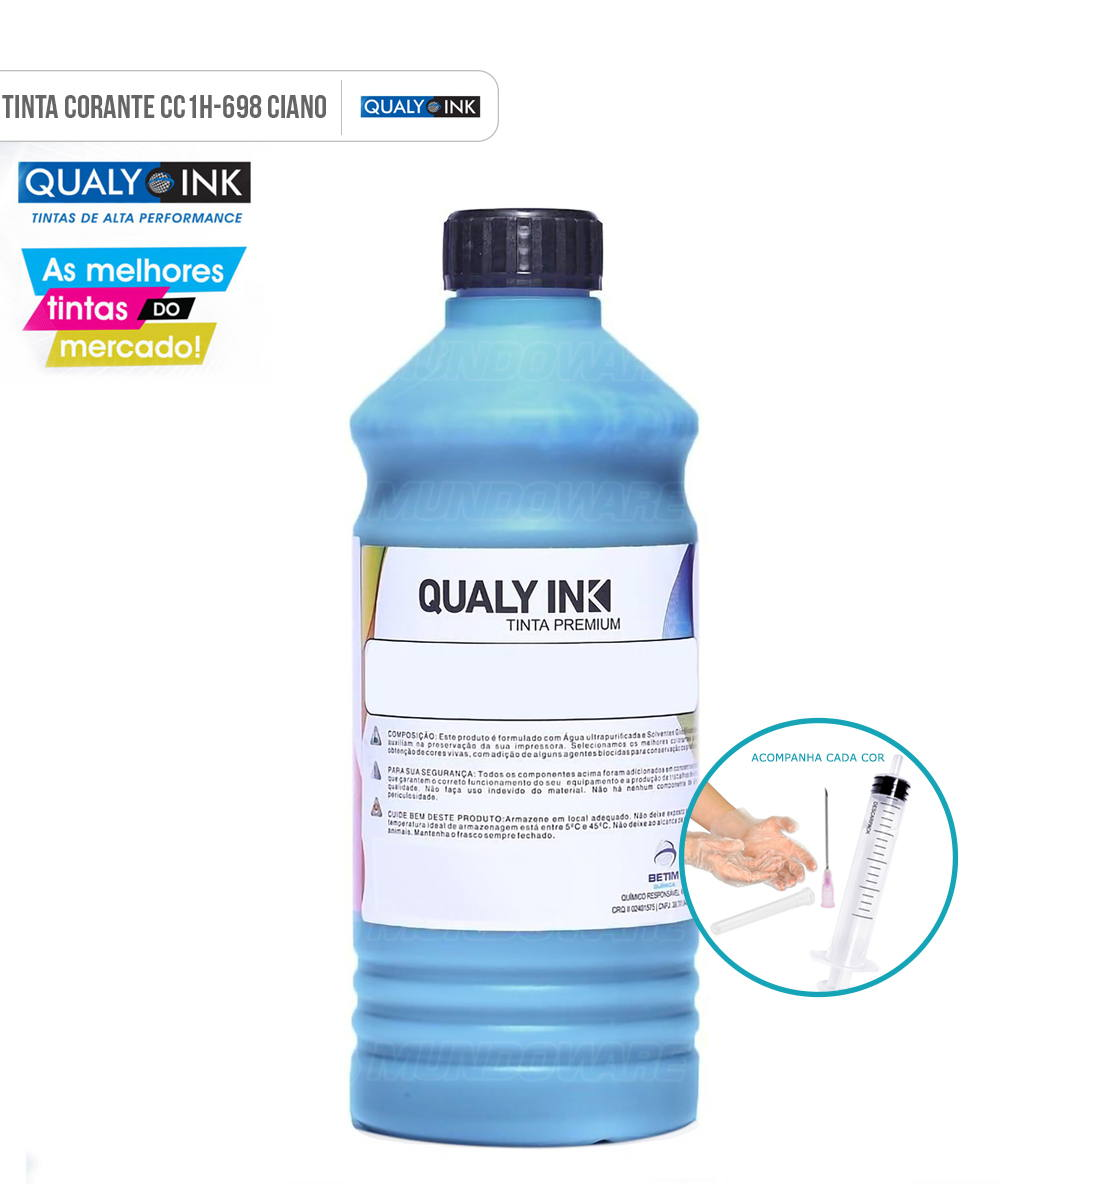 Tinta Cyan para Recarga de Cartucho para impressora HP - modelos 60 61 122 662 664 22 75 93